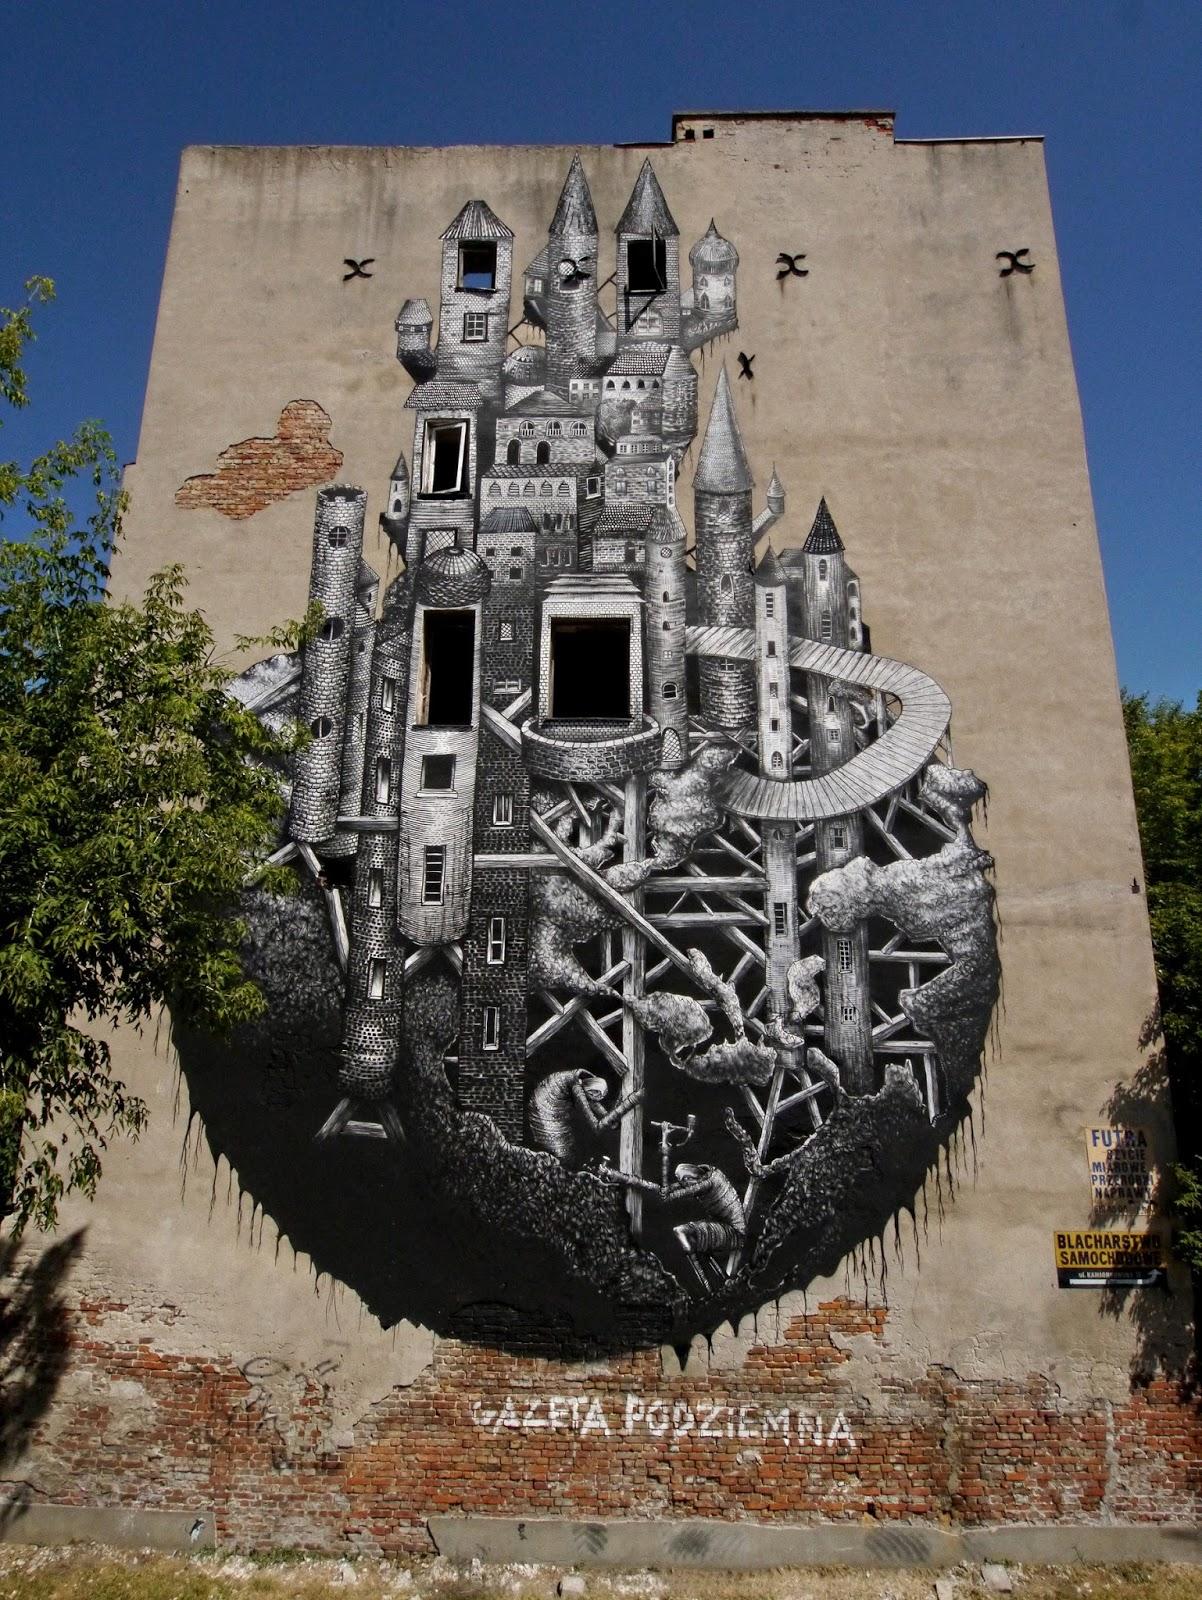 Phlegm New Mural In Warsaw Poland Streetartnews